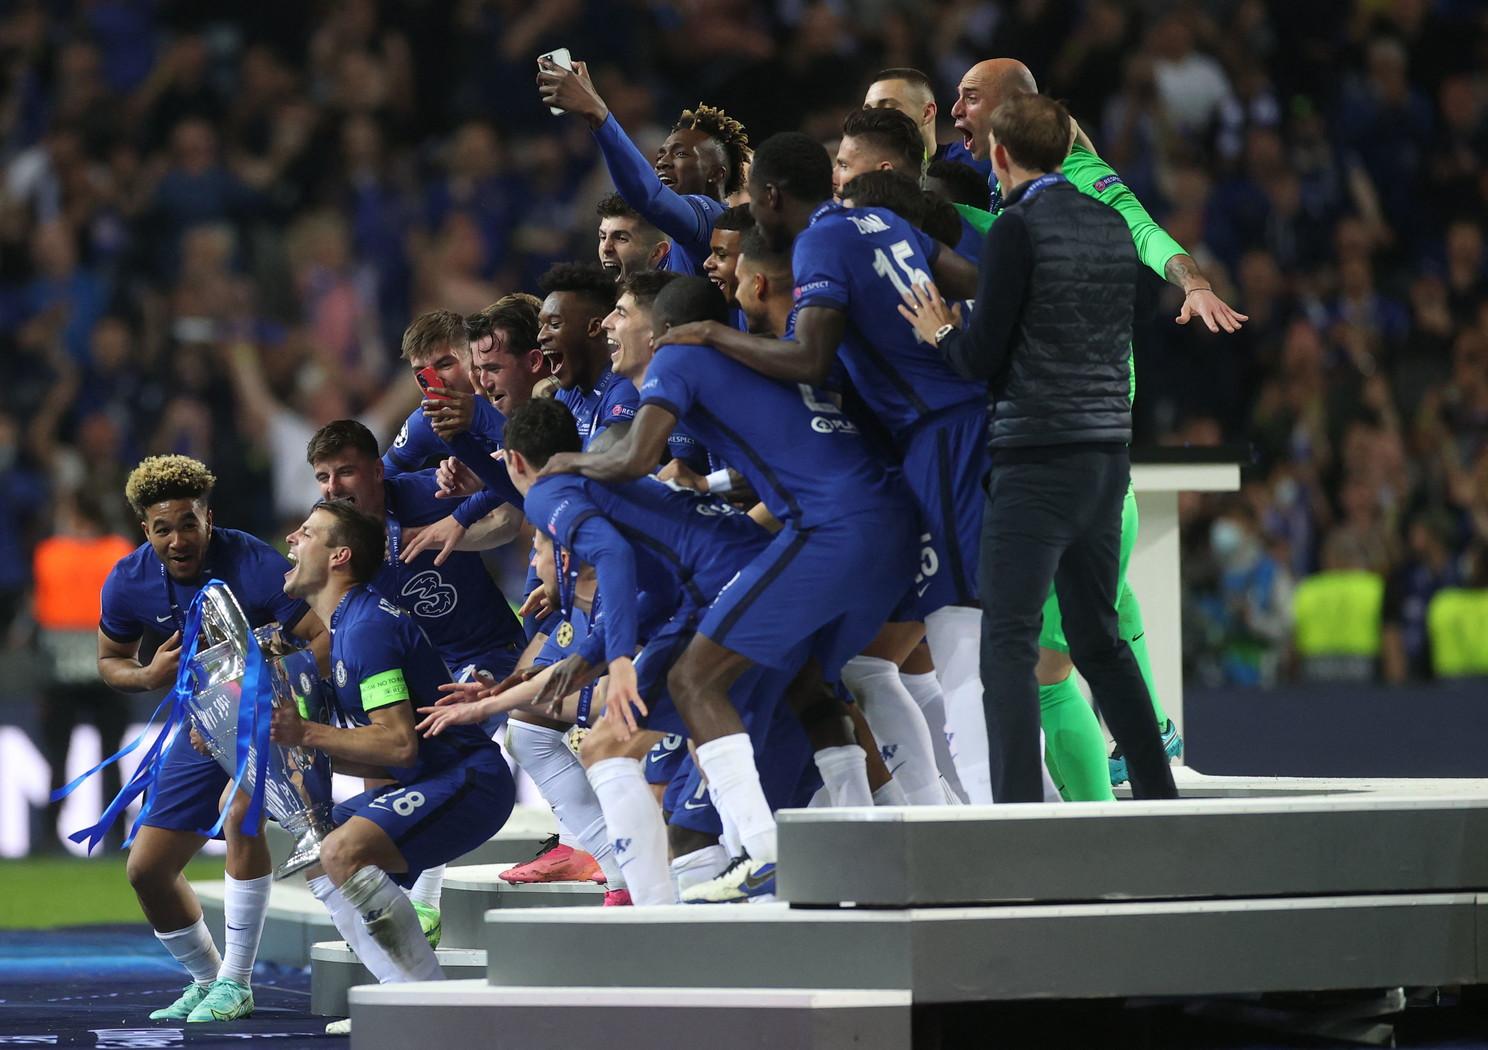 Champions League, Chelsea campione d'Europa: Manchester City battuto 1-0 grazie ad Havertz